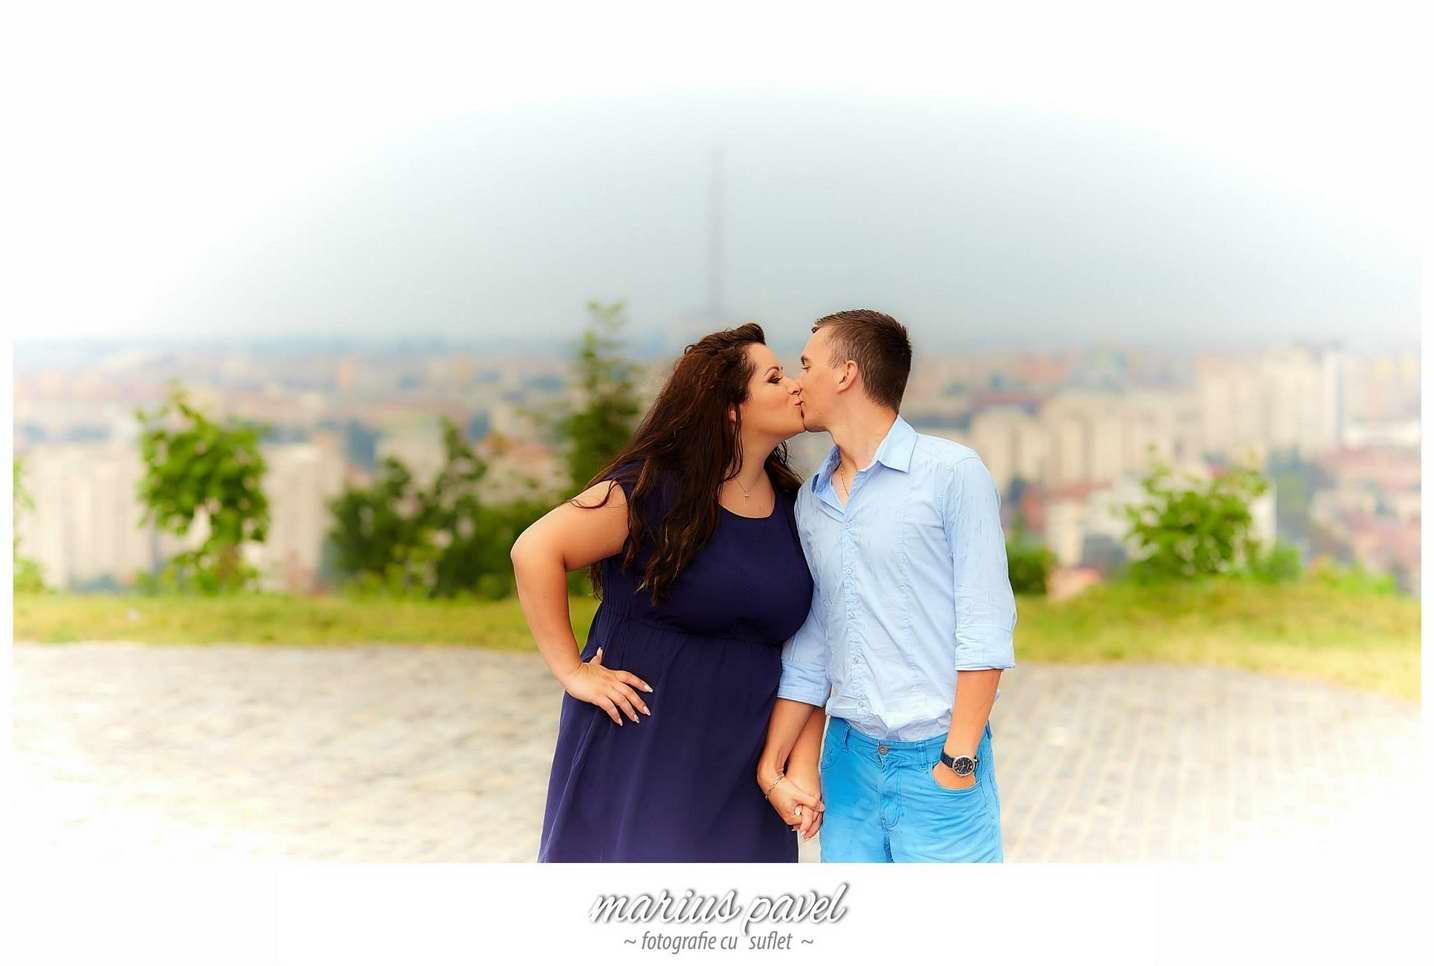 Sedinta de fotografie inainte de nunta la Cetatea Brasov